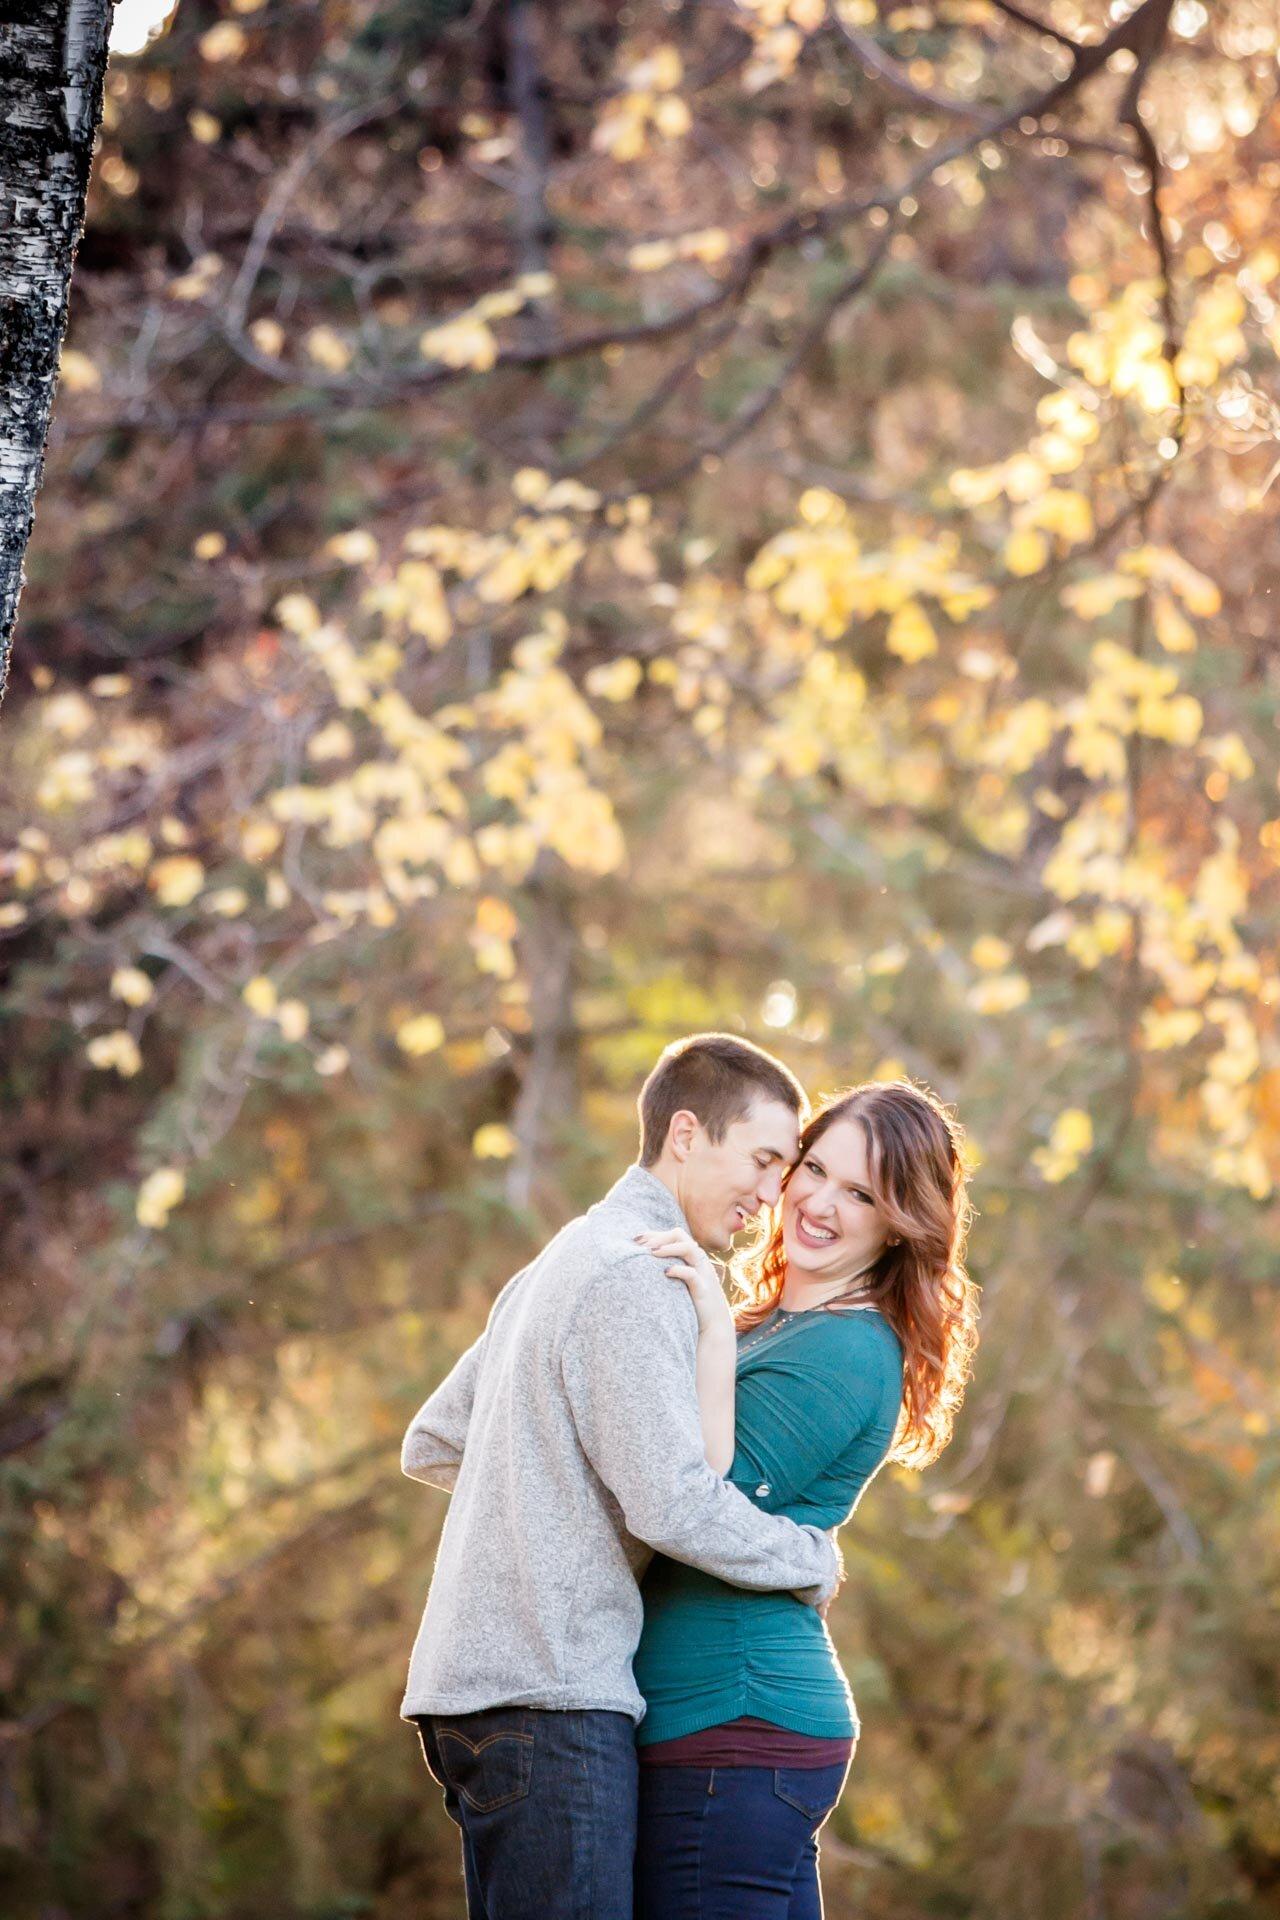 adam-shea-photography-fall-autumn-lighting-engagement-wedding-photos-adam-shea-photography-green-bay-appleton-neenah-photographer-20.jpg